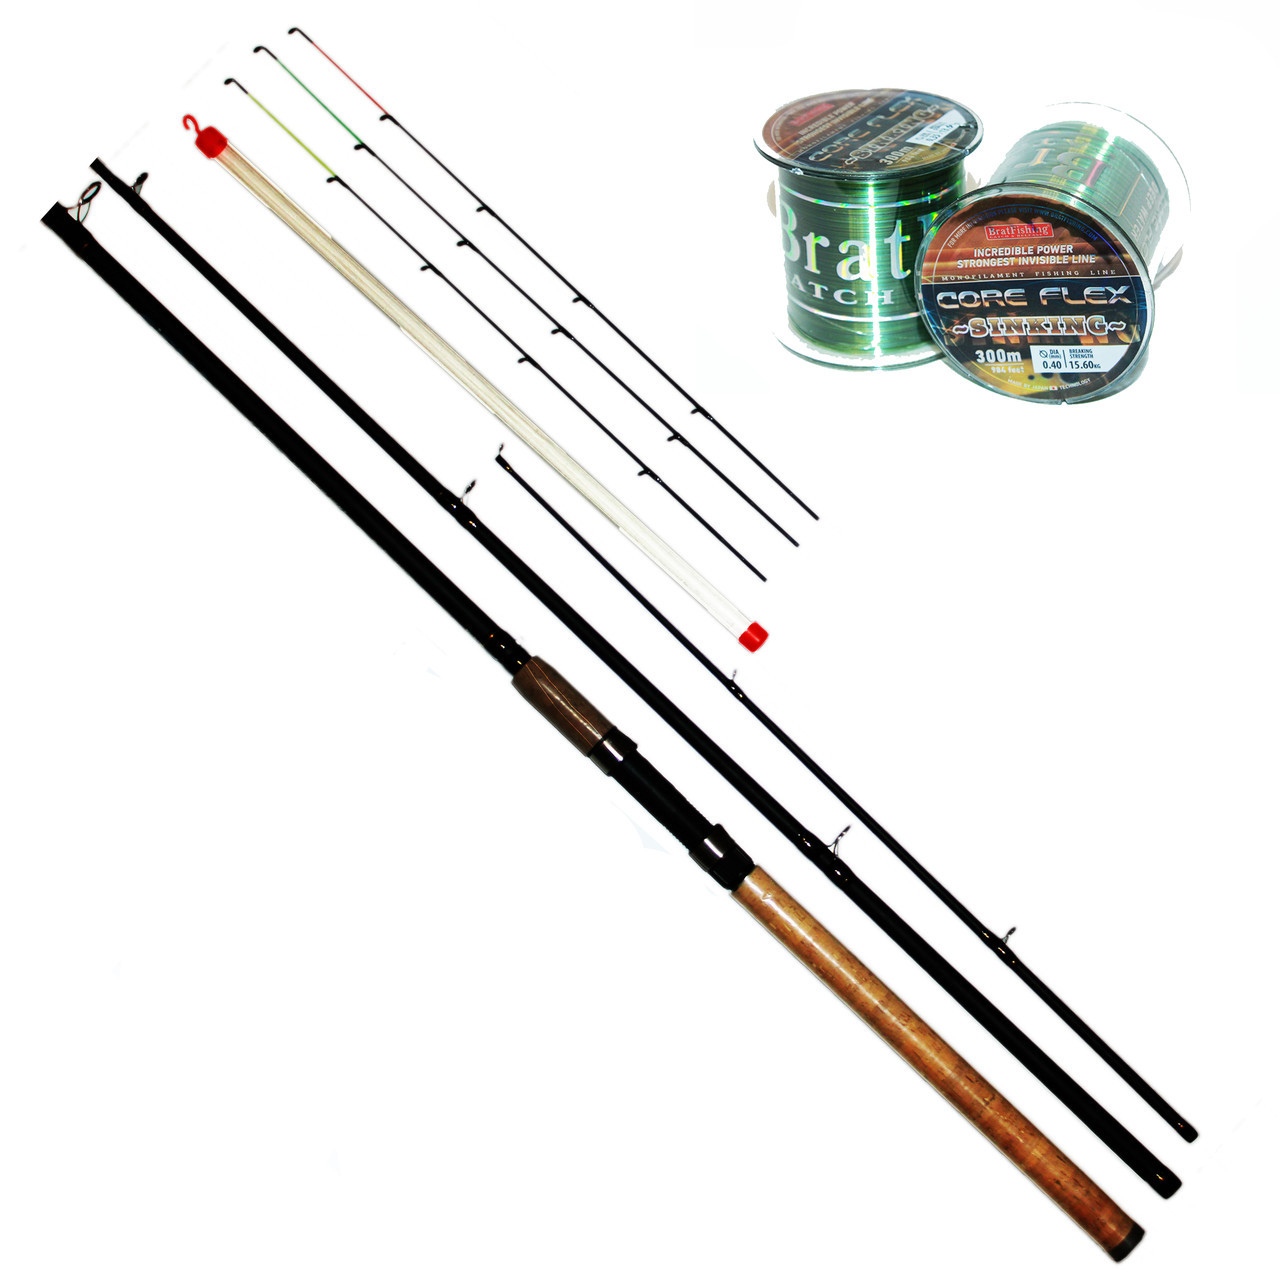 Фідерне вудилище Bratfishing TAIPAN FEEDER +3 tips / 3.0 M / g 80-180